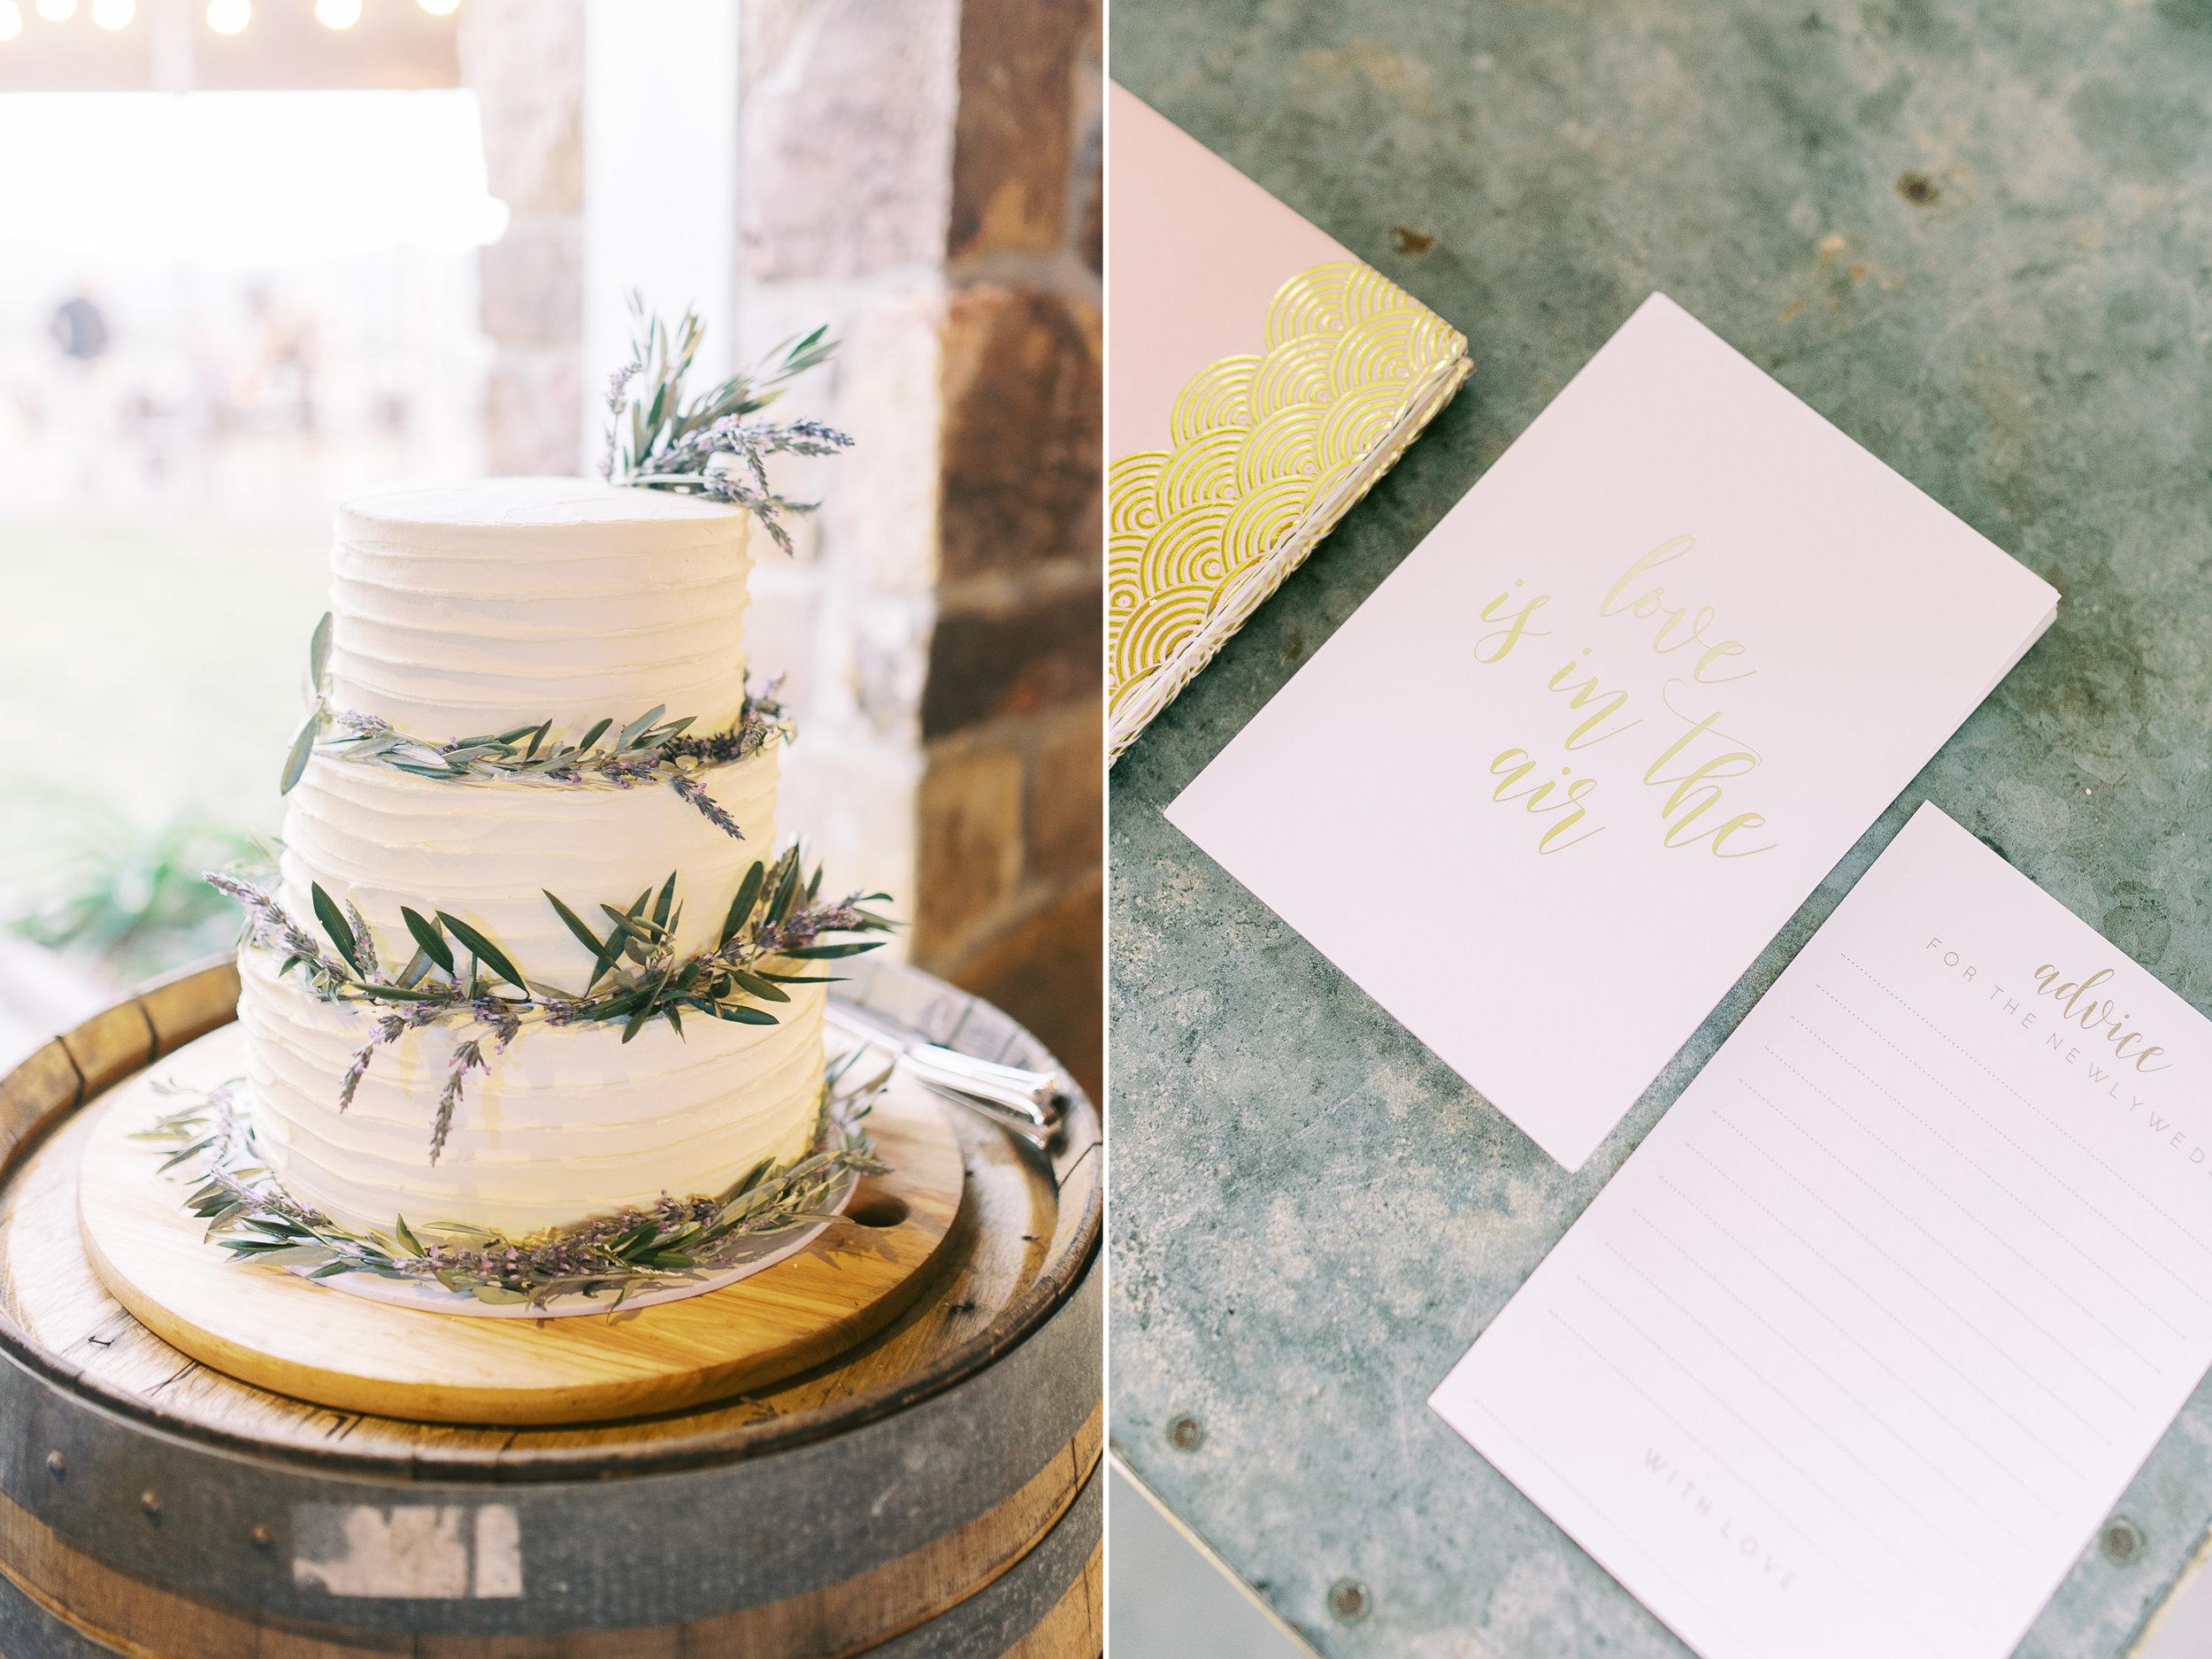 kooroomba-lavendar-farm-film-photography-wedding-photography-romantic-25.jpg